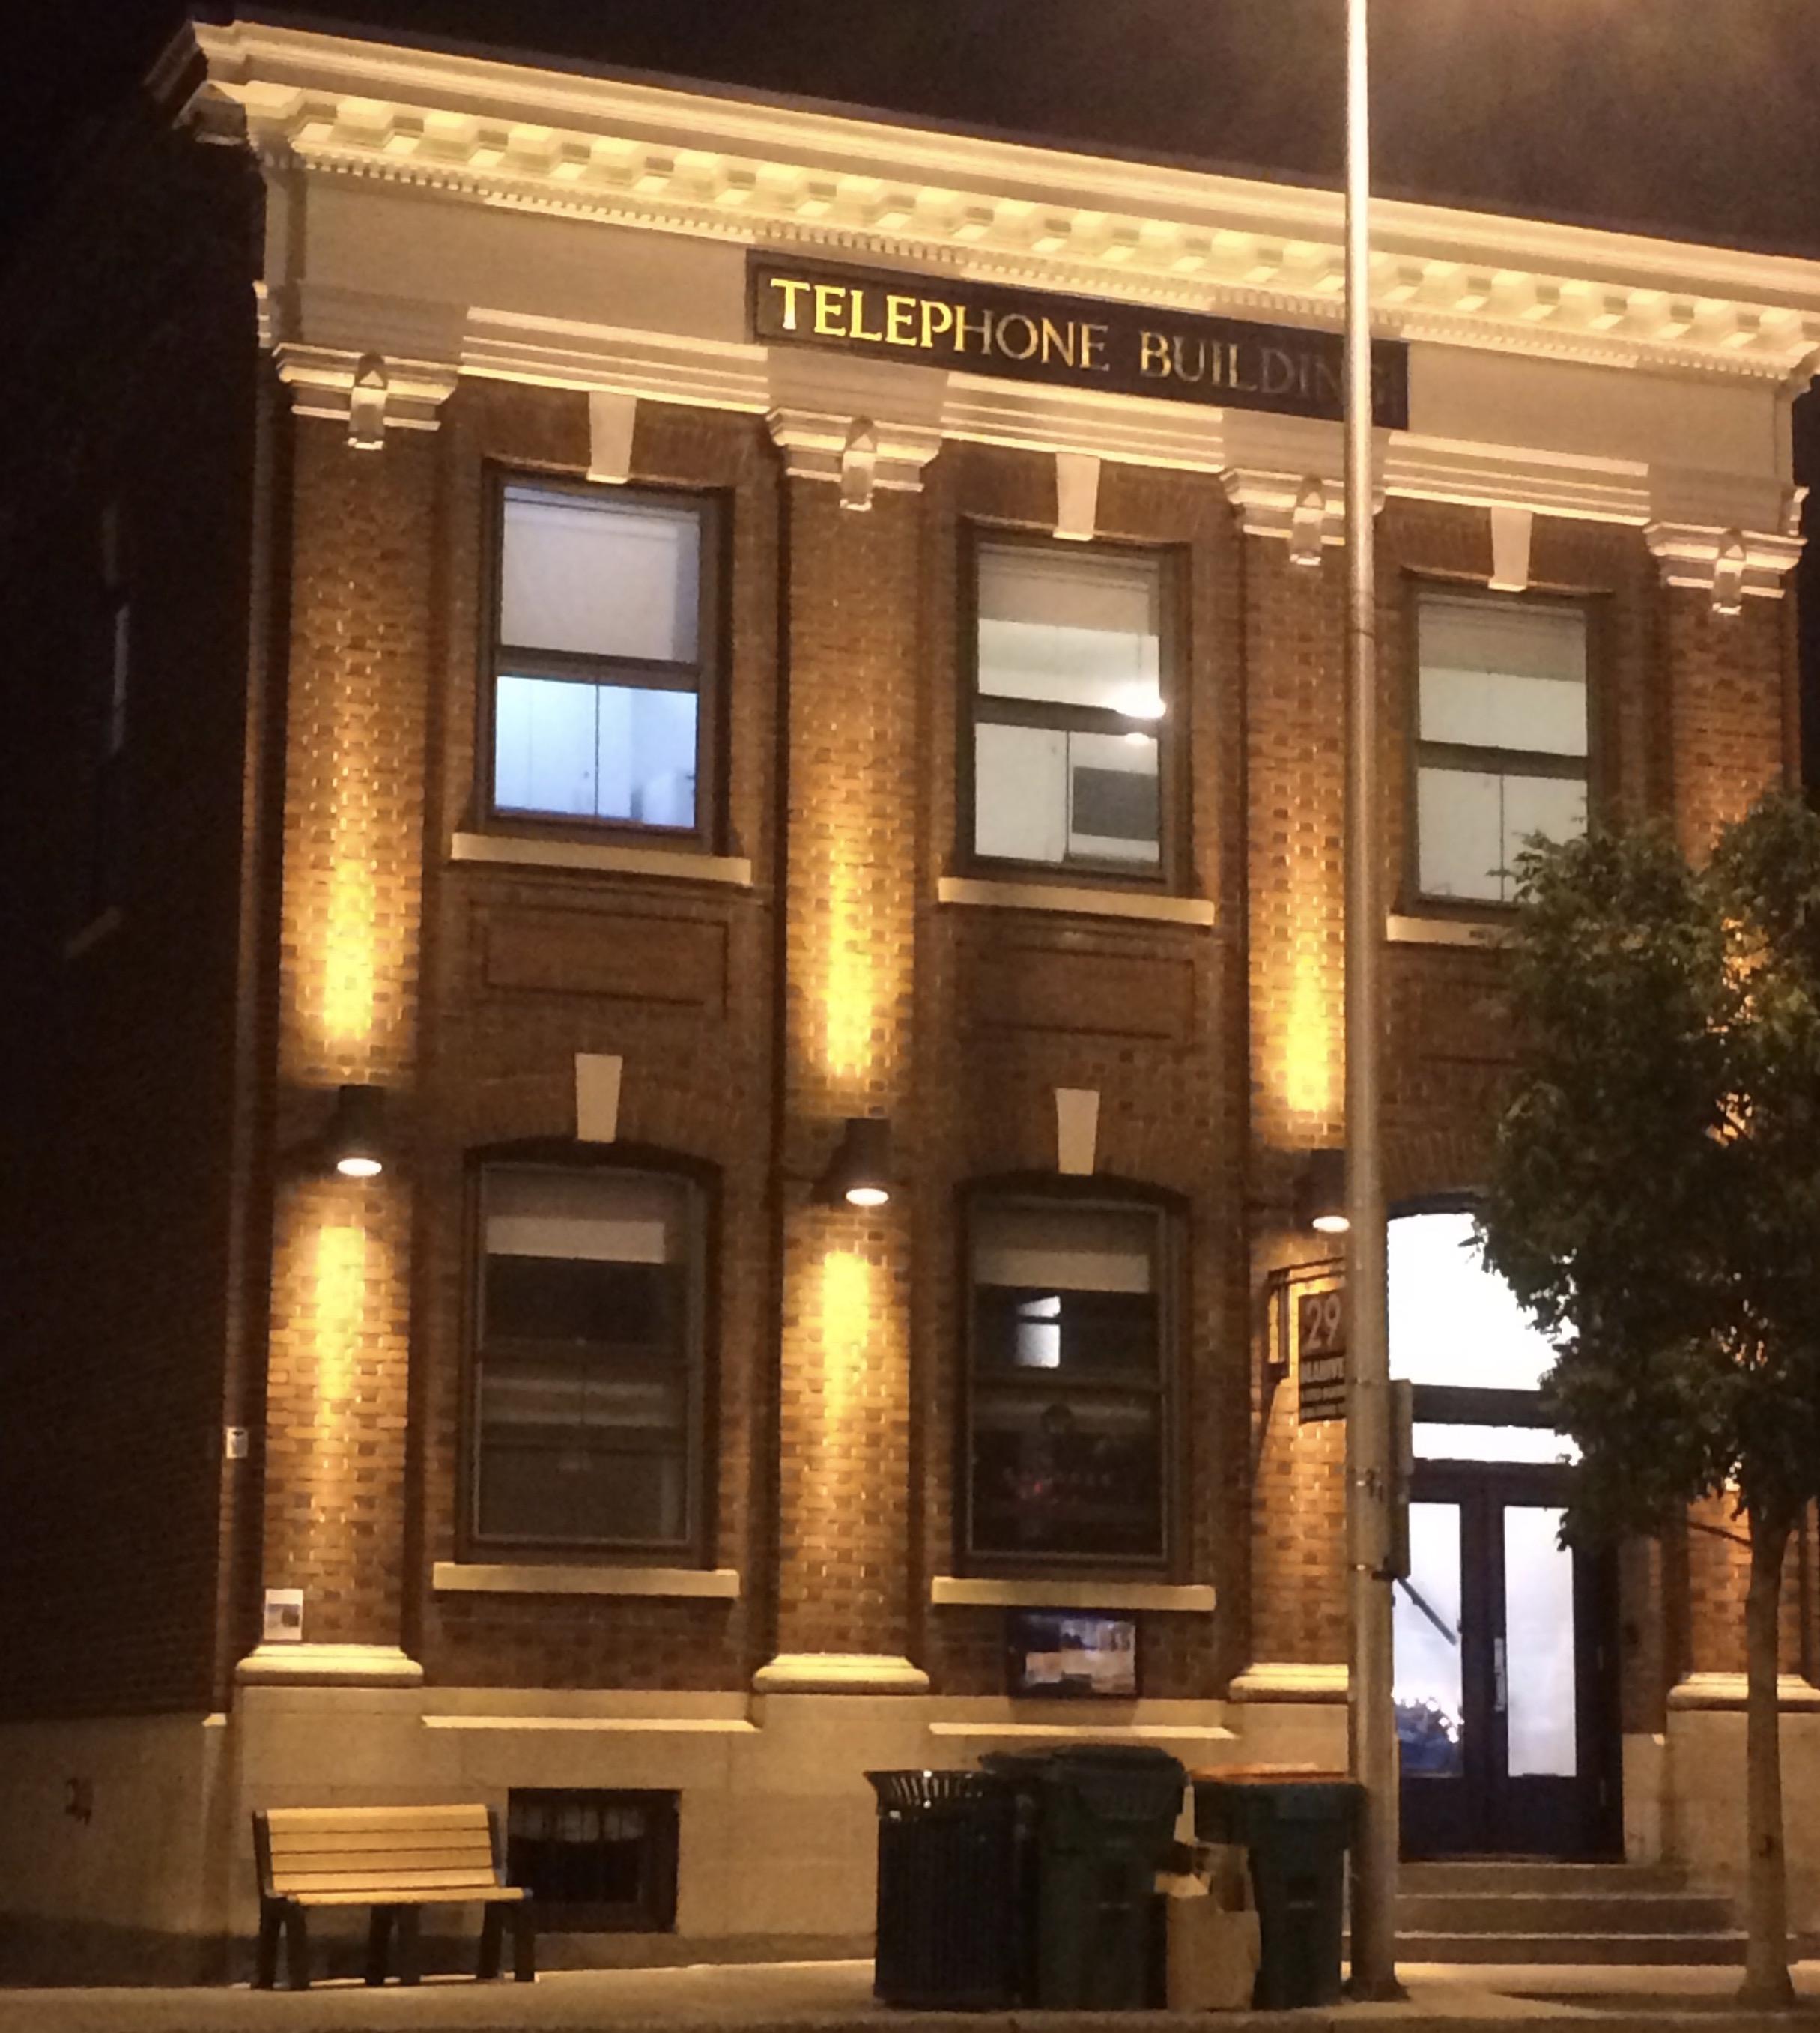 telephone building at night.jpg